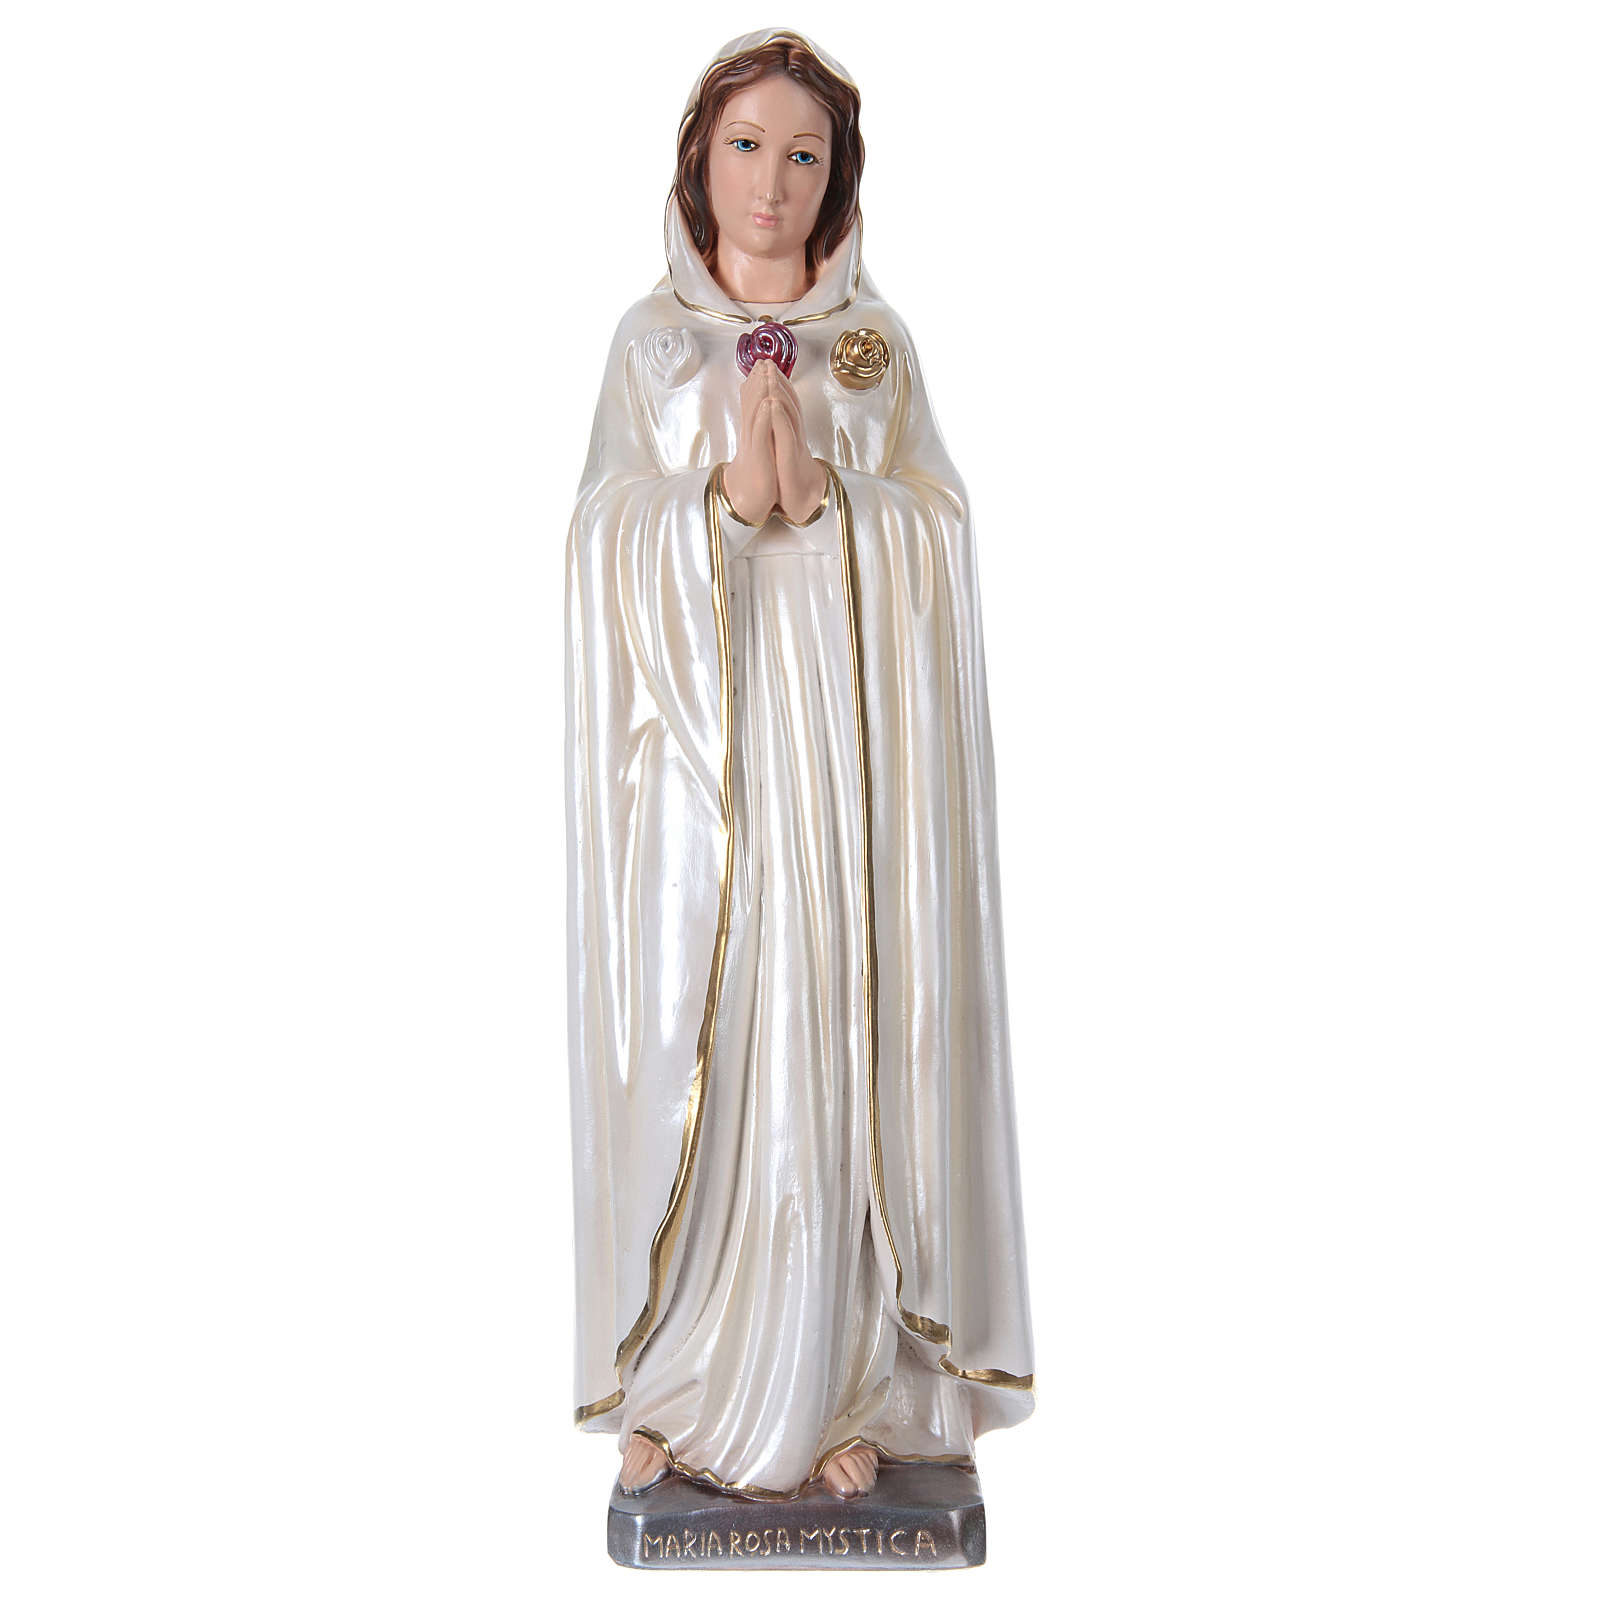 Santa Maria Rosa Mistica in gesso madreperlato 50 cm 4